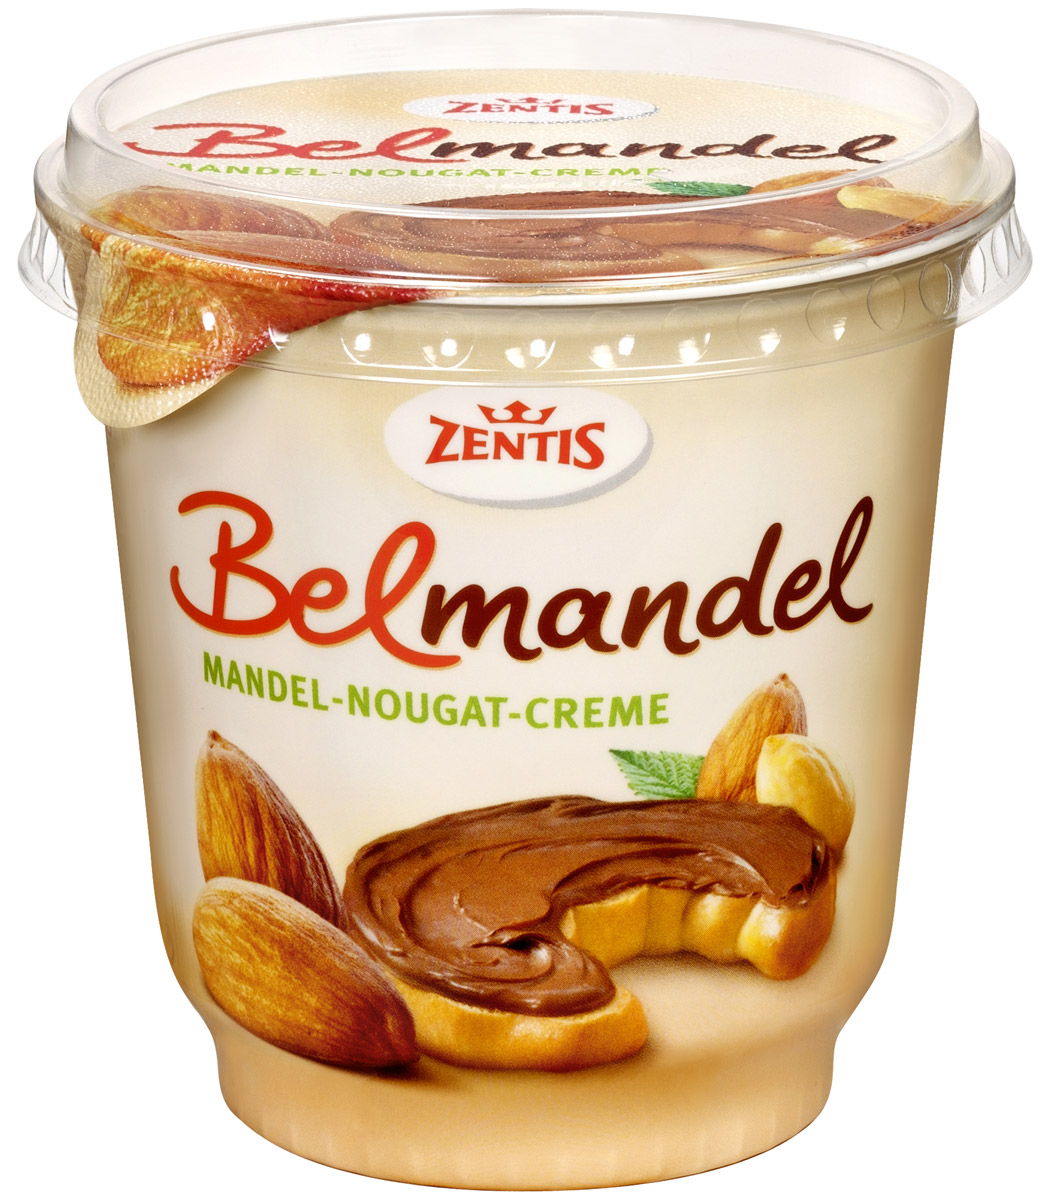 Zentis Belmandel шоколадная паста с миндалем и какао, 400 г naturaliber паста шоколадная с абрикосом 225 г